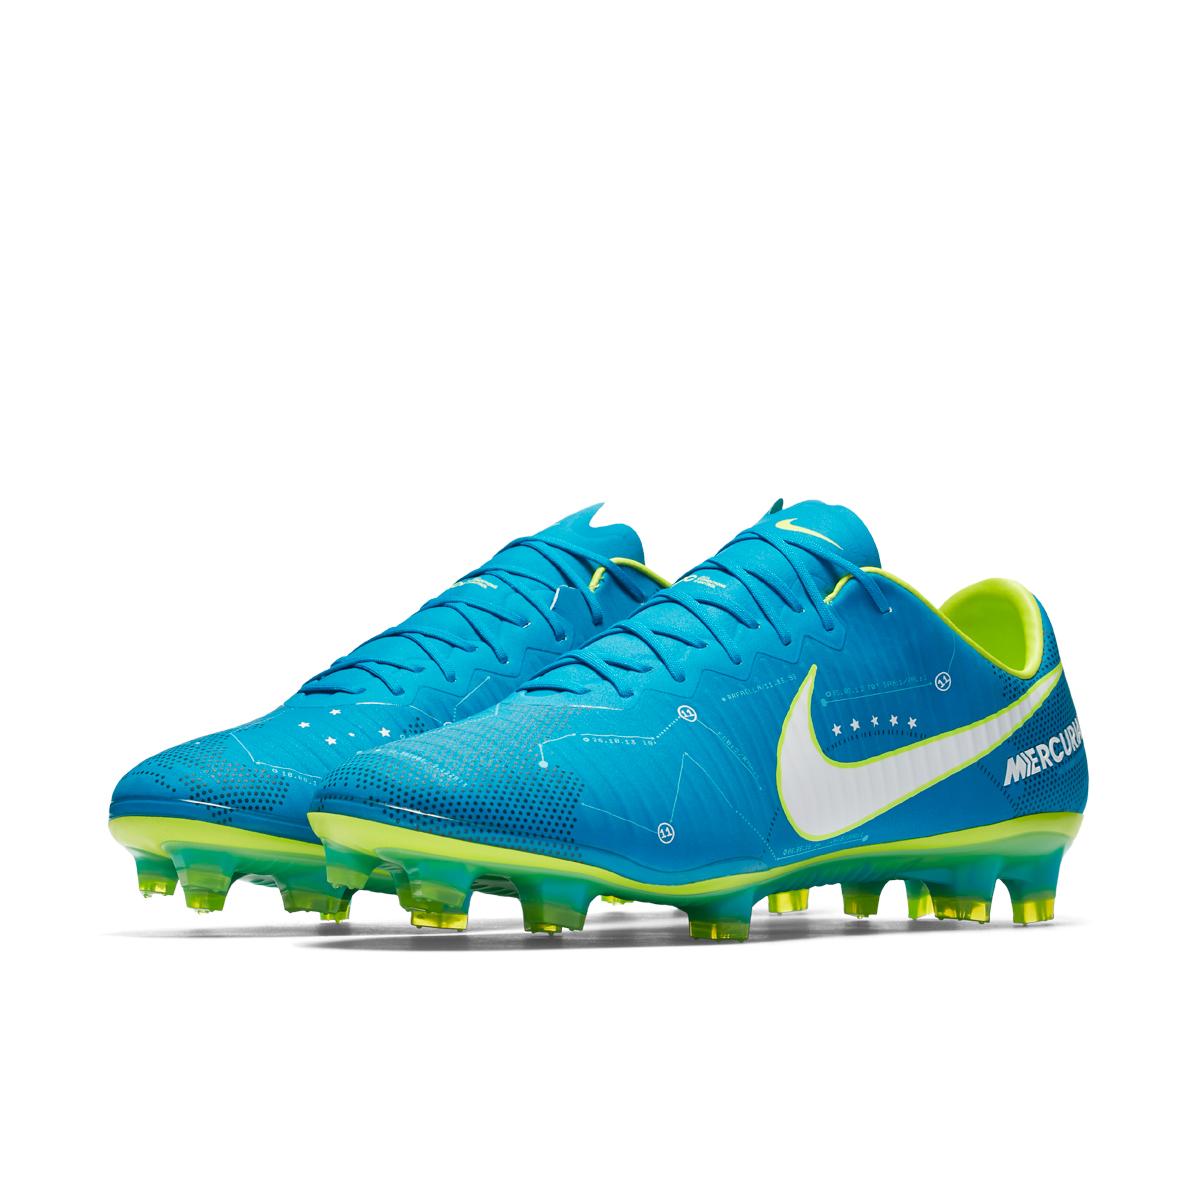 Nike Neymar Shoes